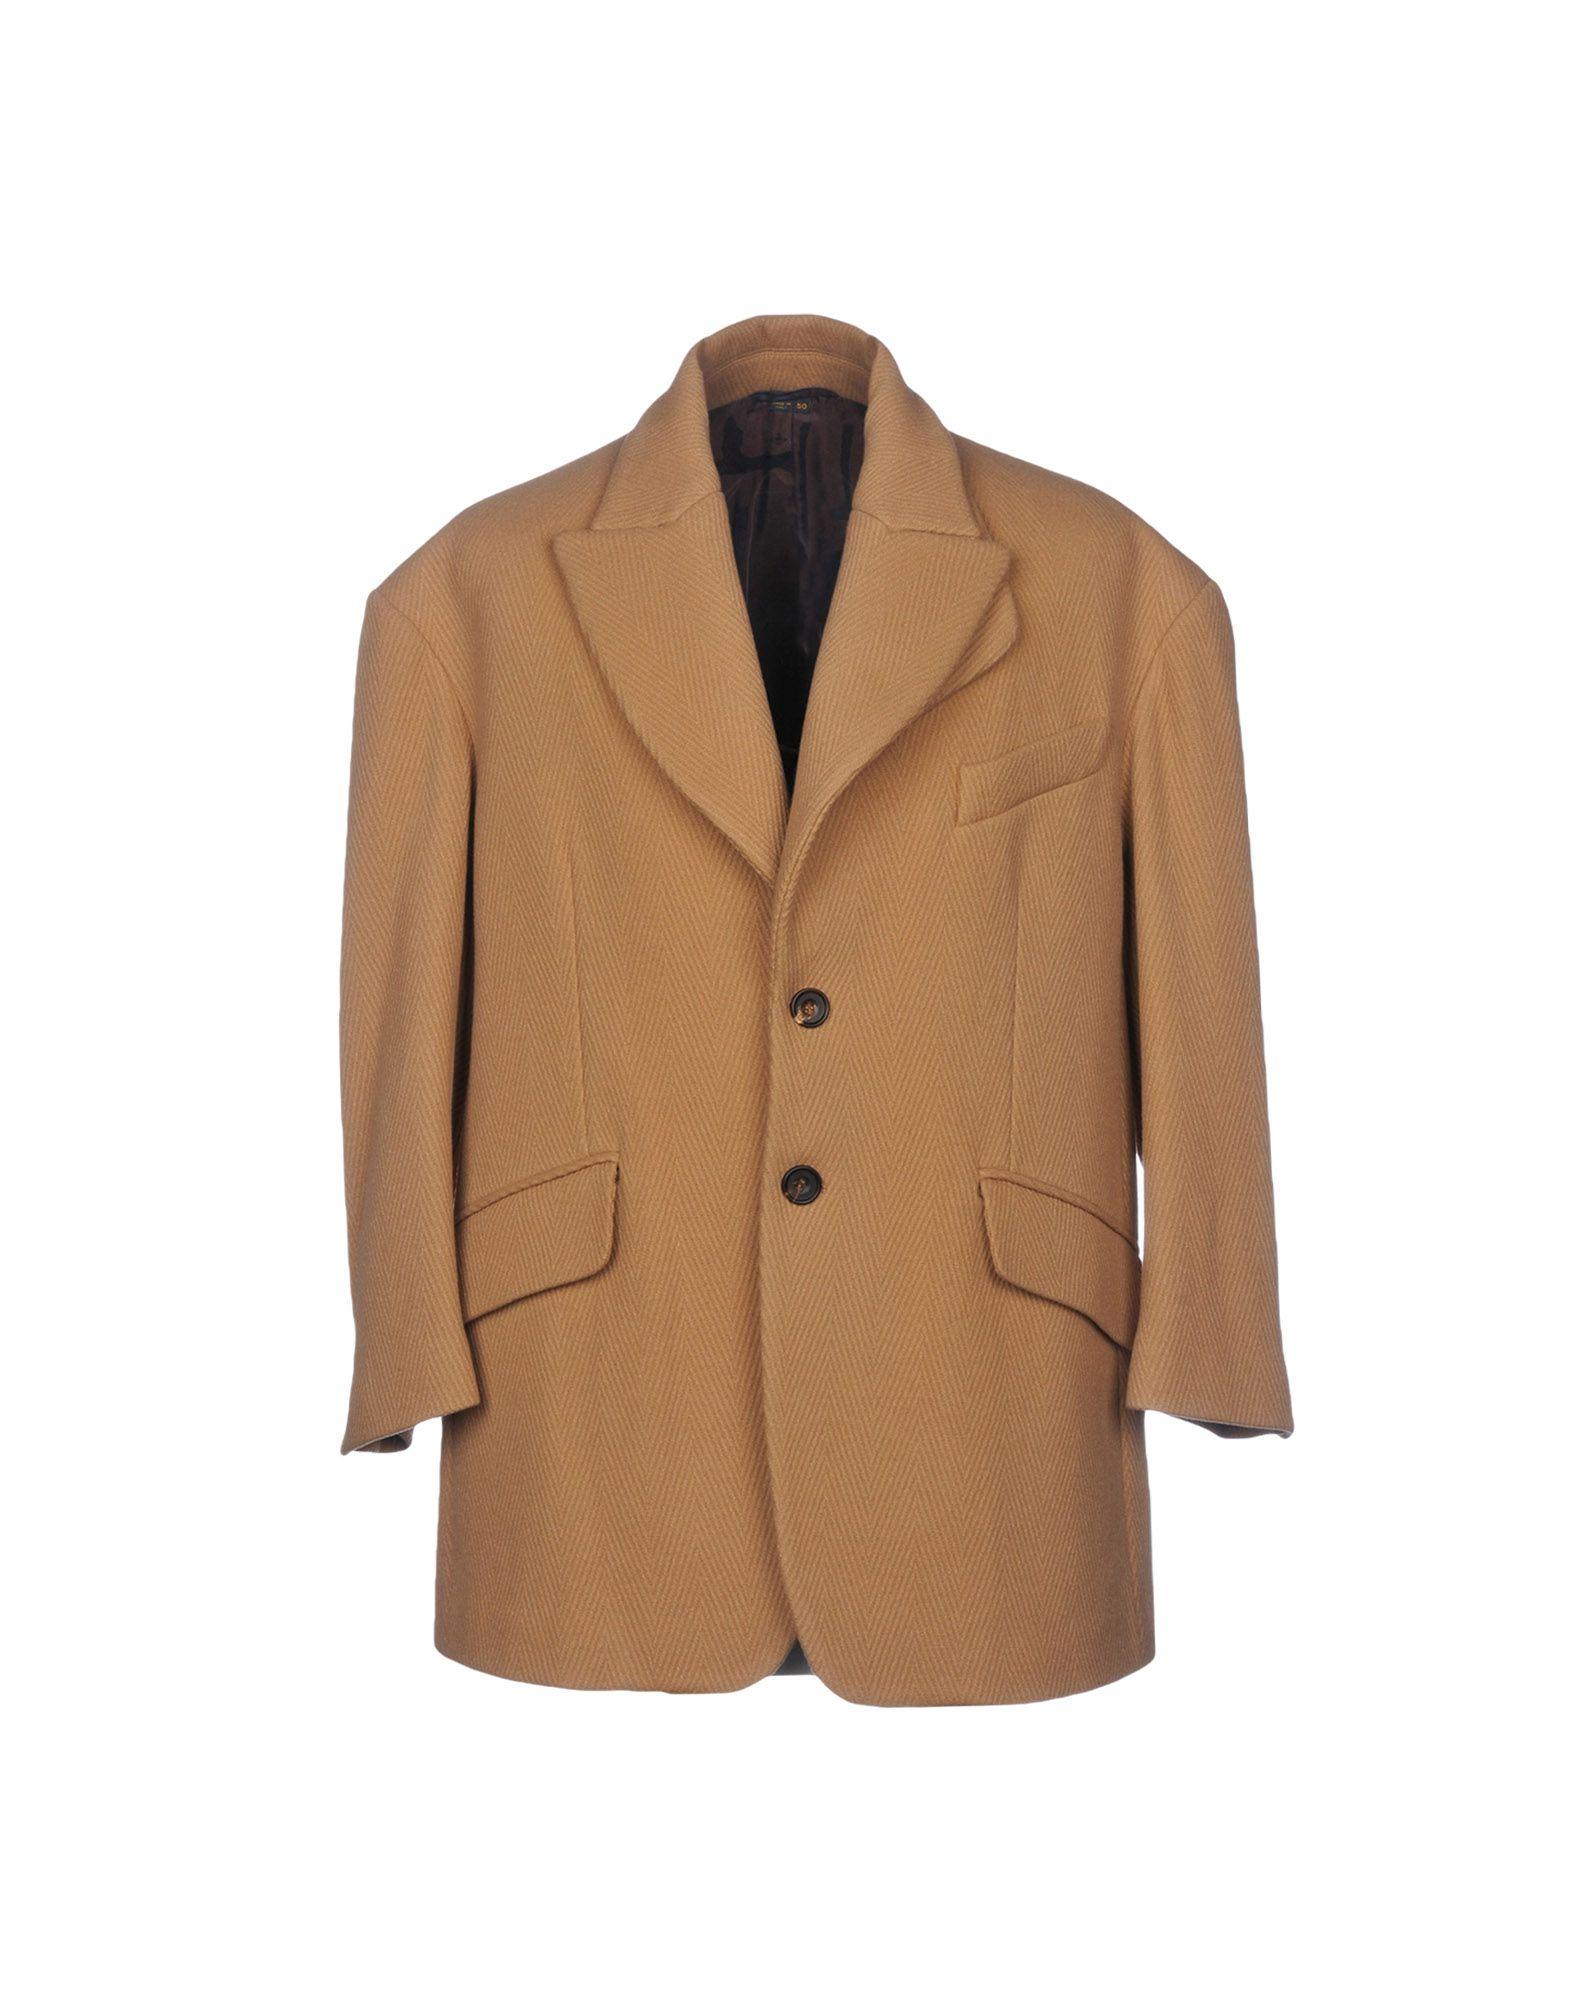 VIVIENNE WESTWOOD MAN Coat in Camel